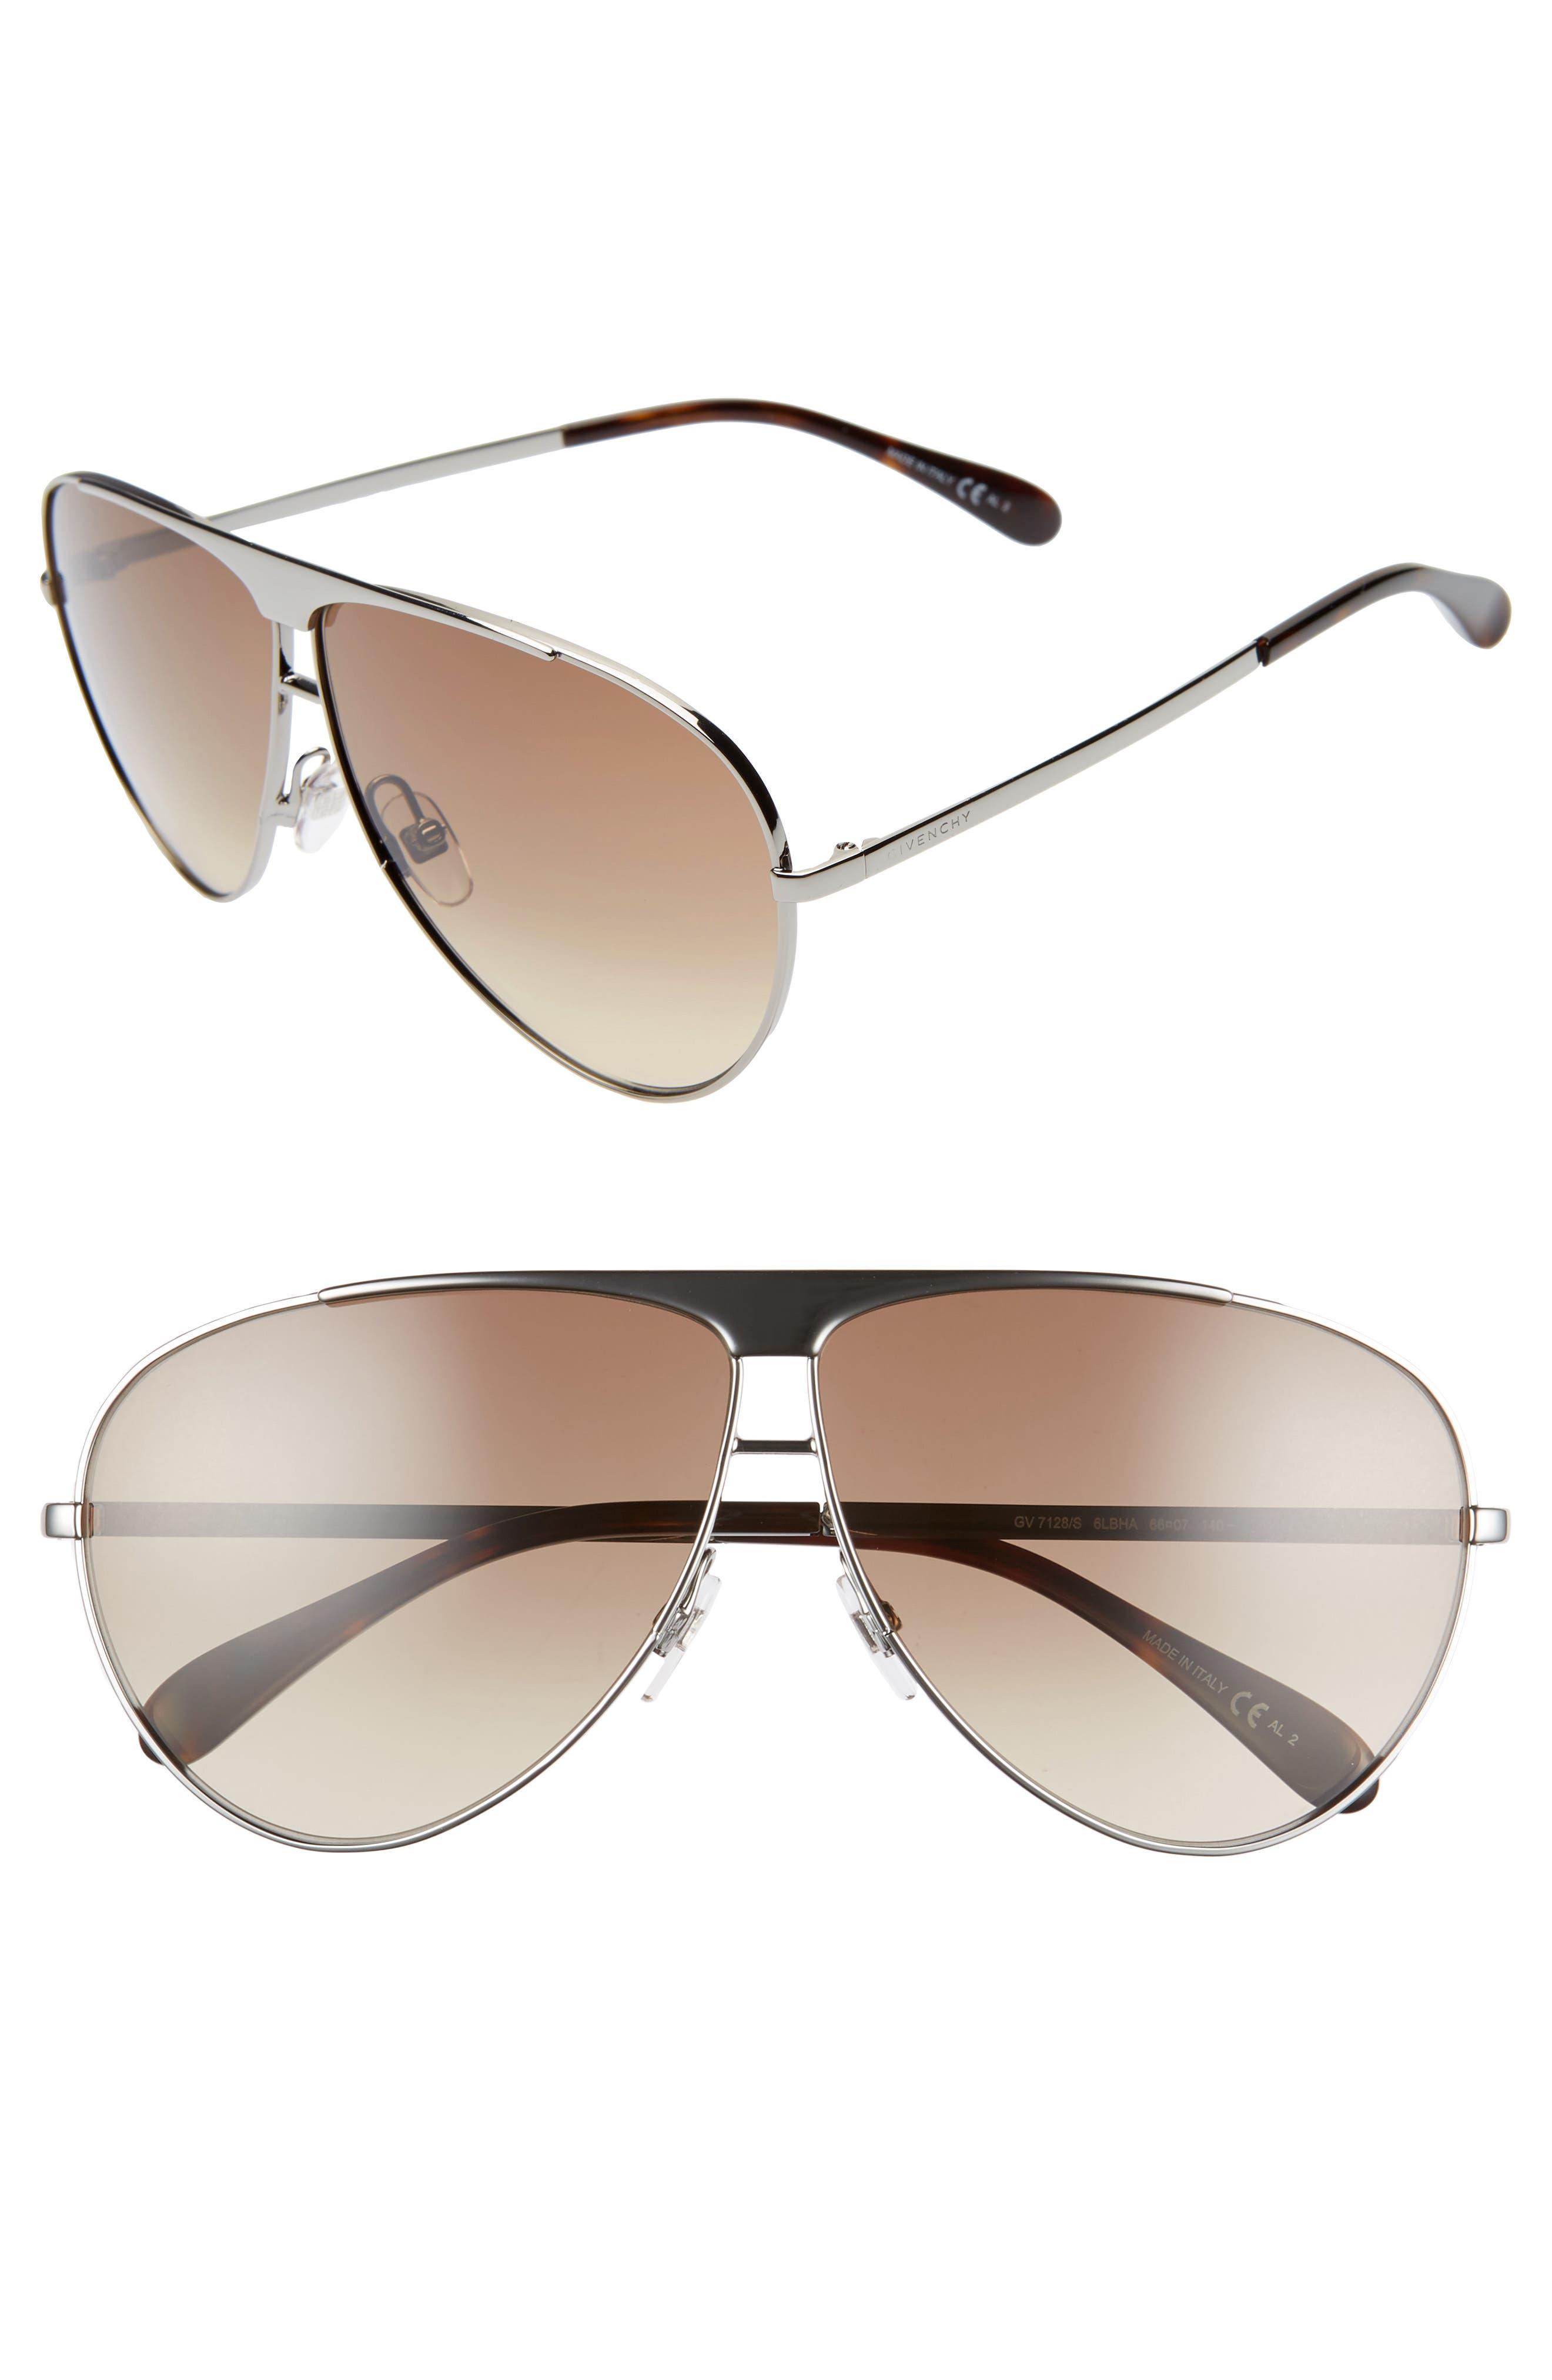 Givenchy 6m Aviator Sunglasses - Ruthenium/ Grey